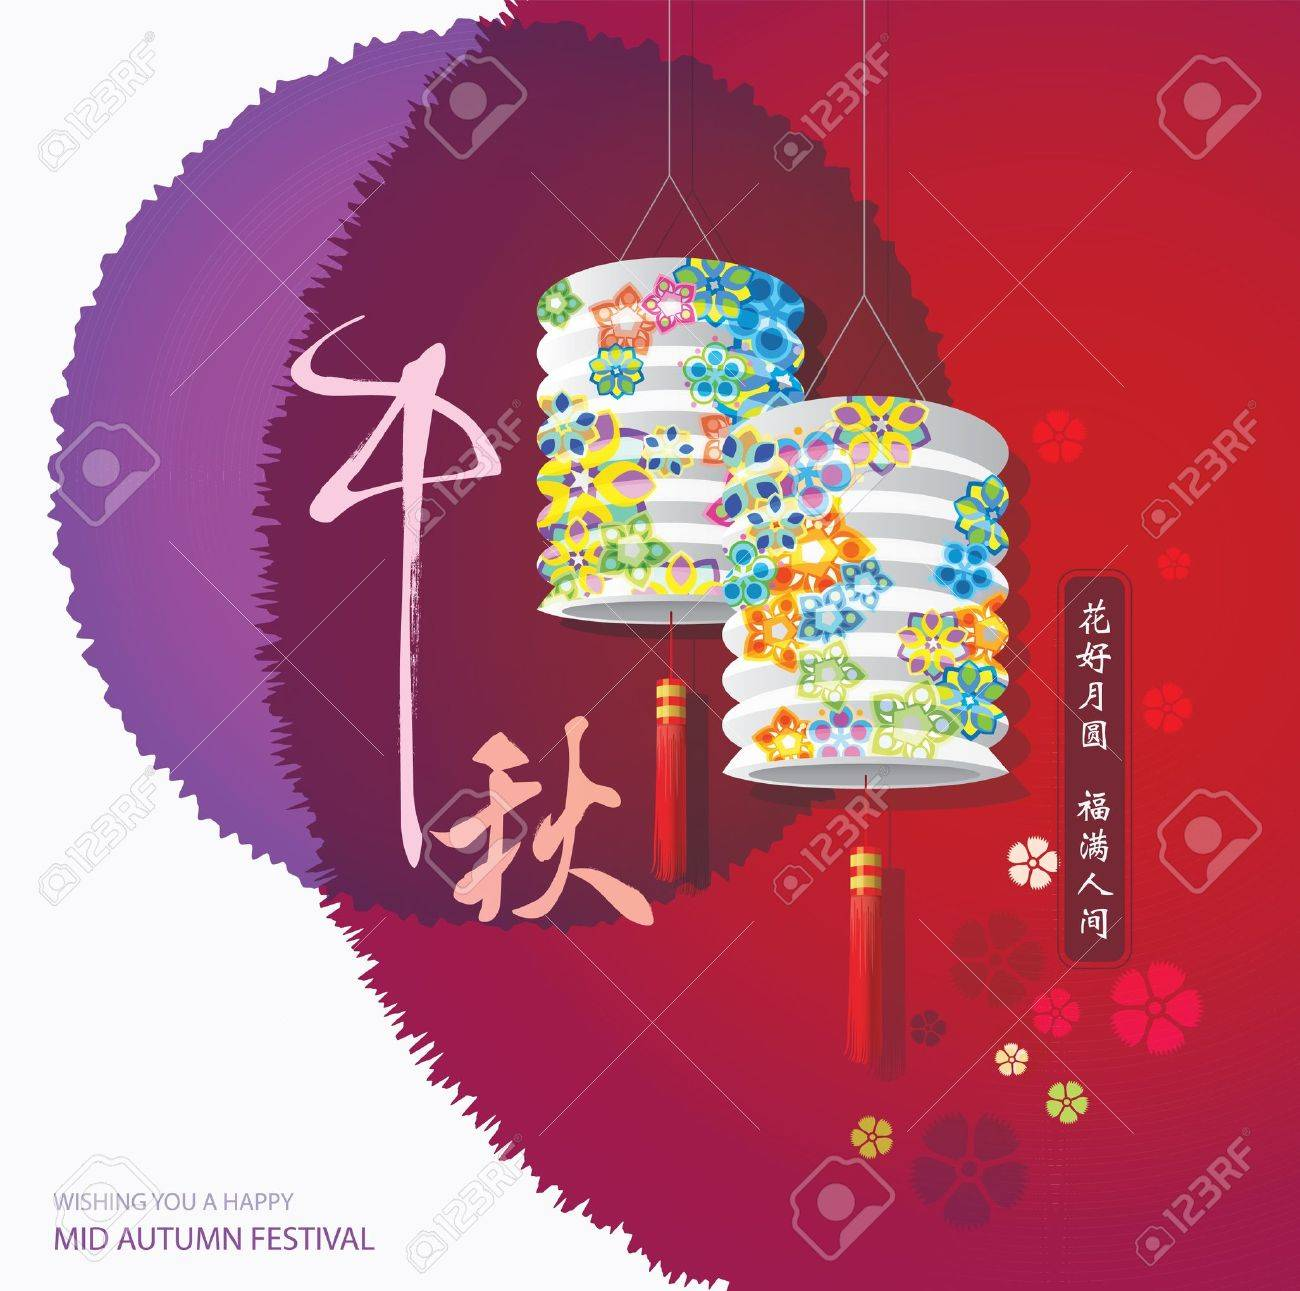 Chinese lantern festival graphic design Stock Vector - 22127937